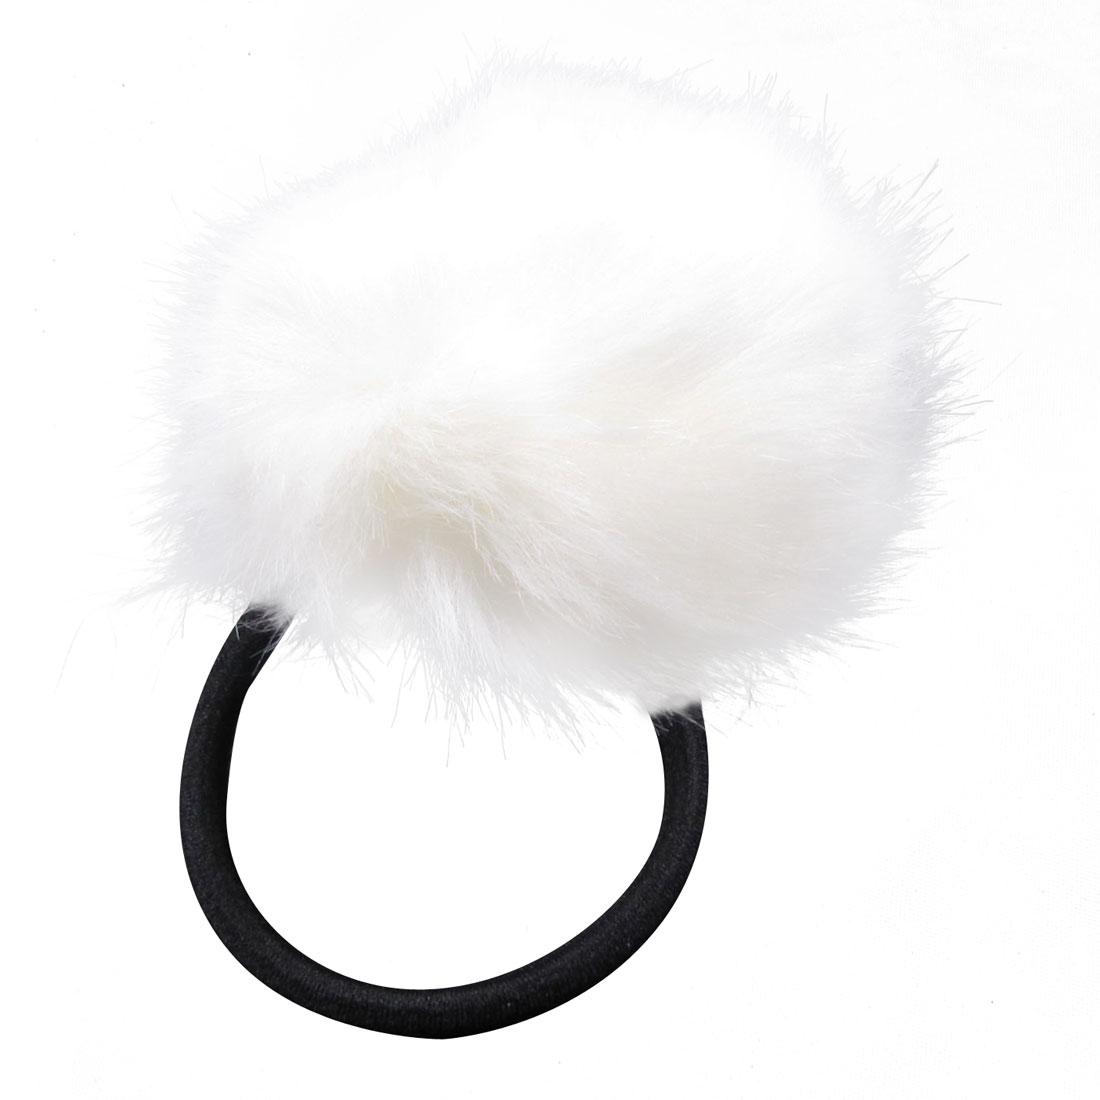 White Plush Ball Decor Black Elastic Band Hair Tie Ponytail Holder for Lady